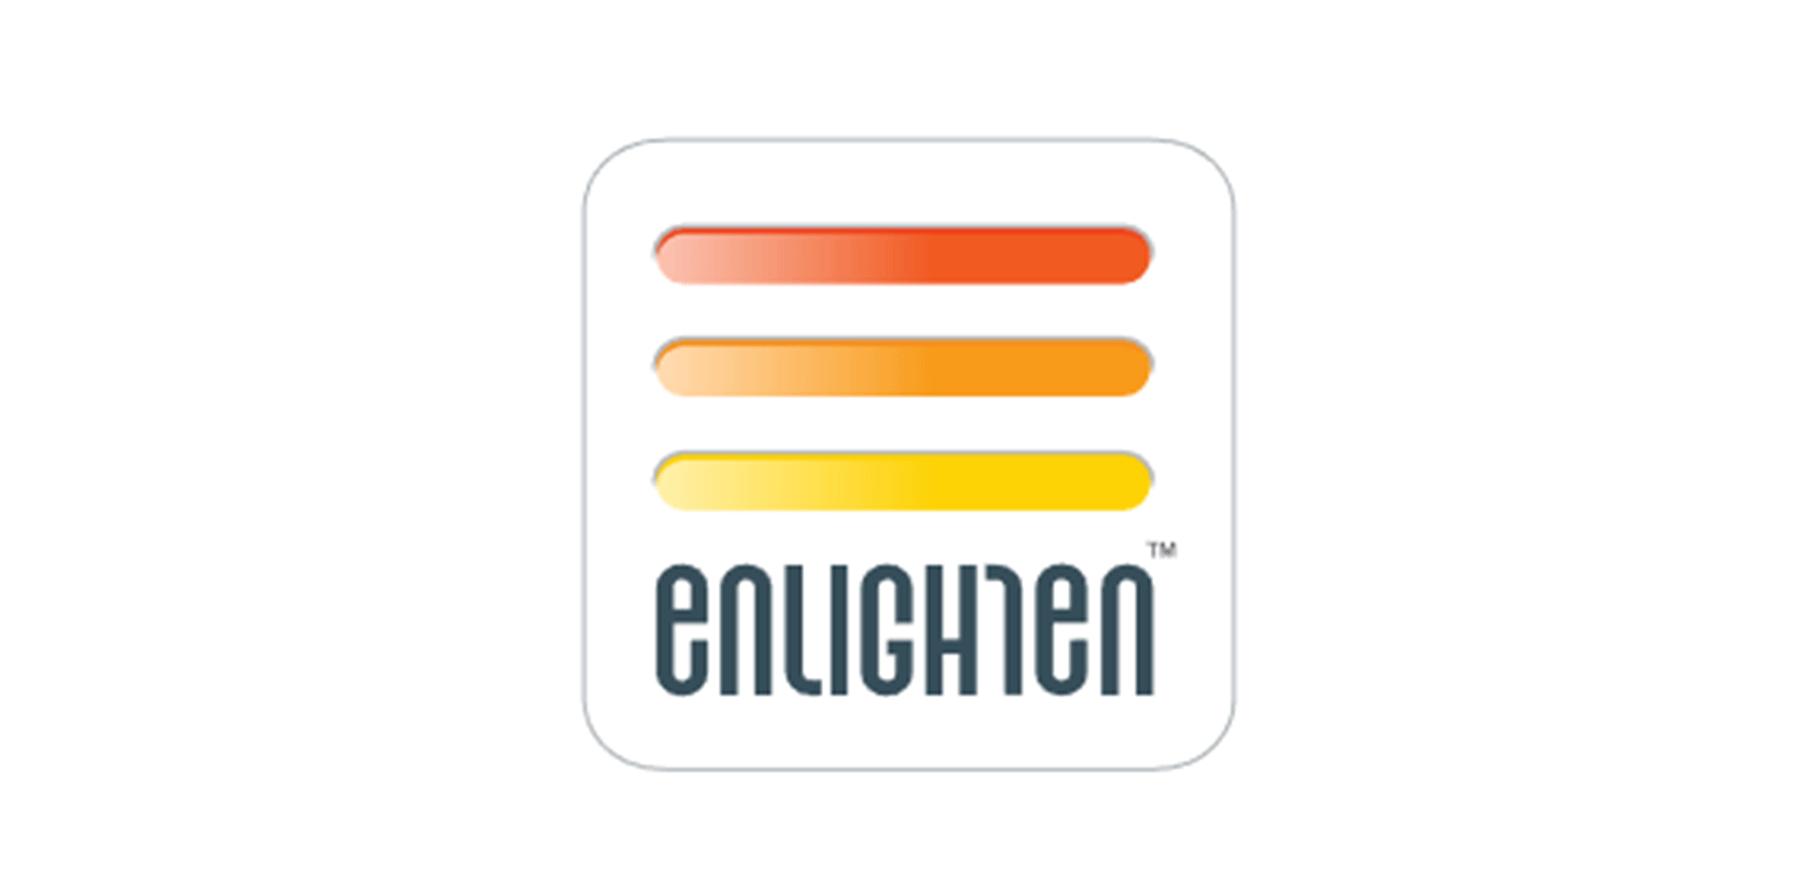 Enlightone: 業界最高水準のGIソリューションリアルタイムGIミドルウェア「Enlighten」レビュー